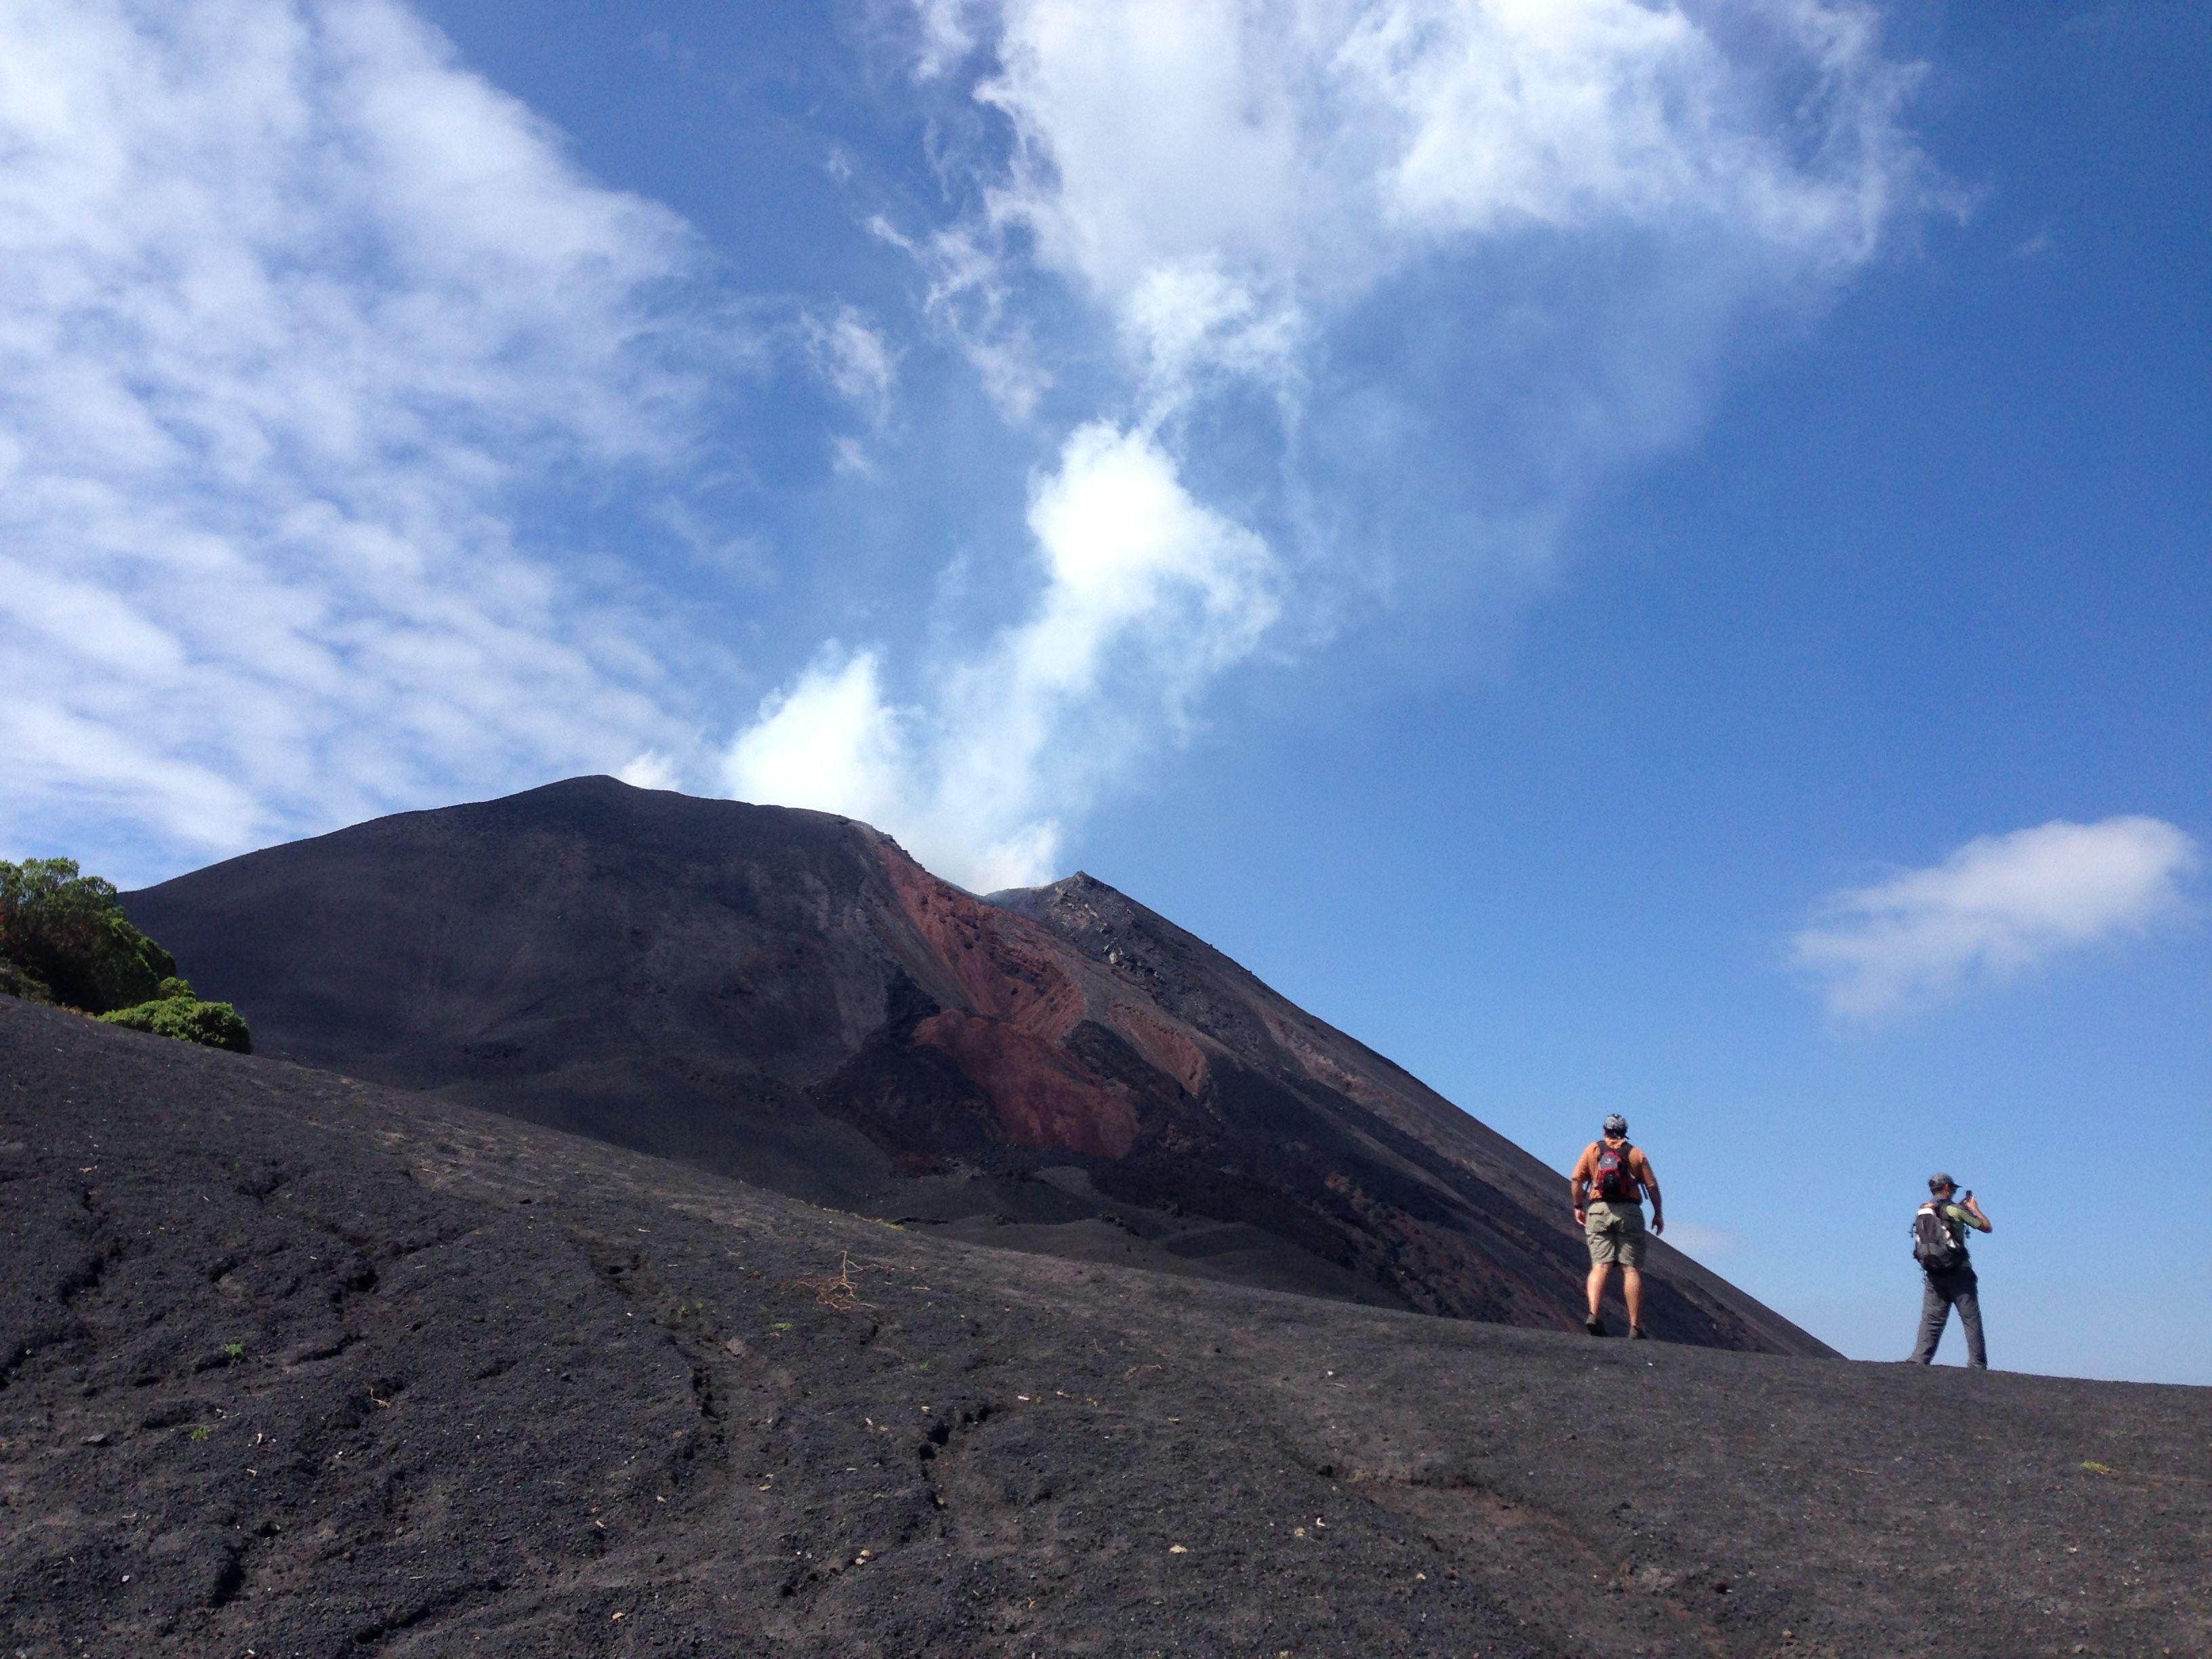 Camping On An Active Volcano In Pacaya Guatemala